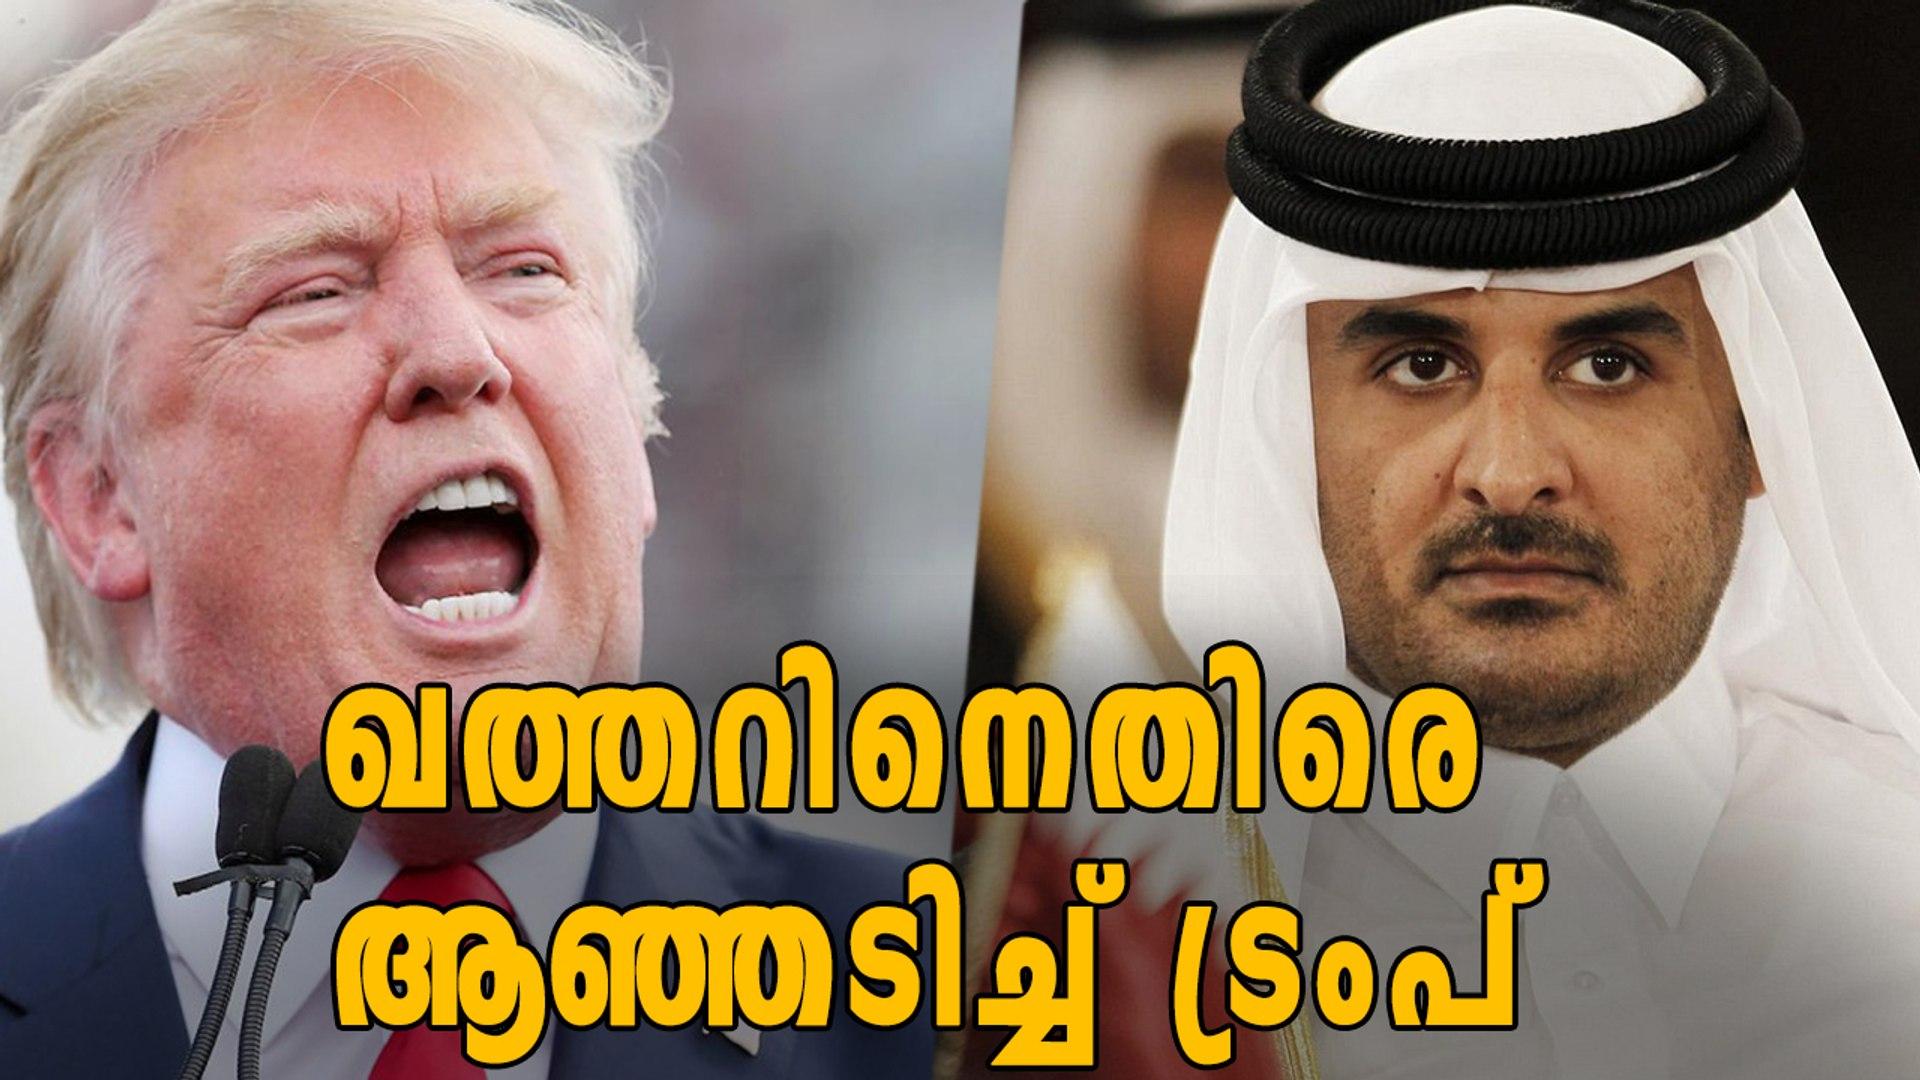 Donald Trump Against Qatar